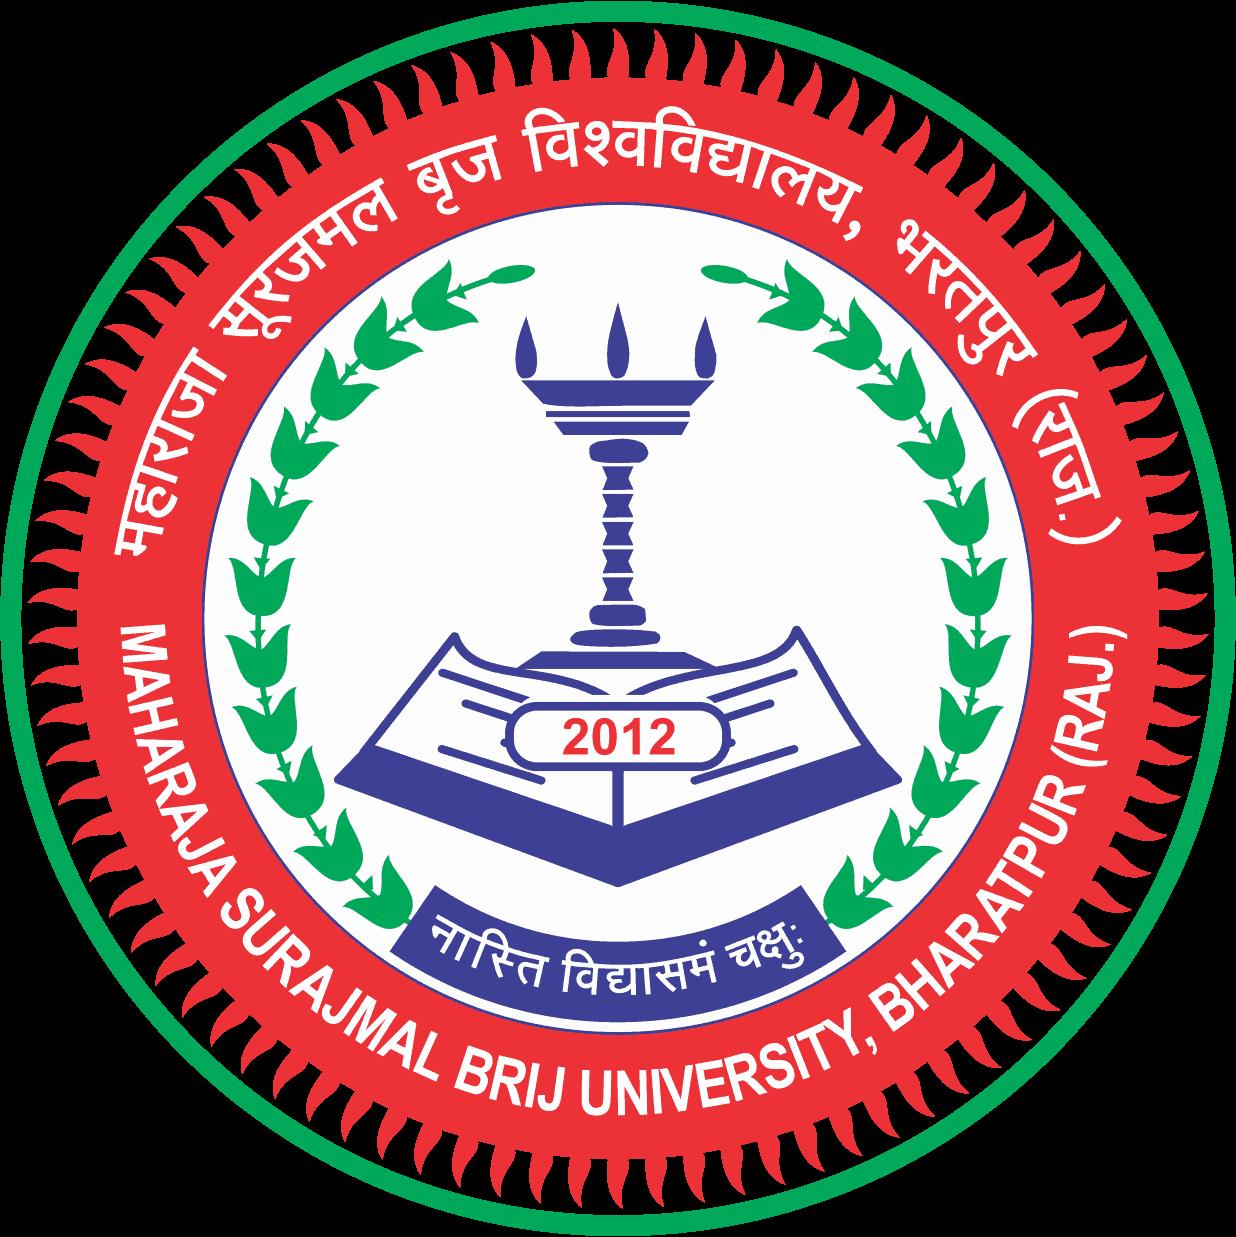 Maharaja Surajmal Brij University (MSBU University)